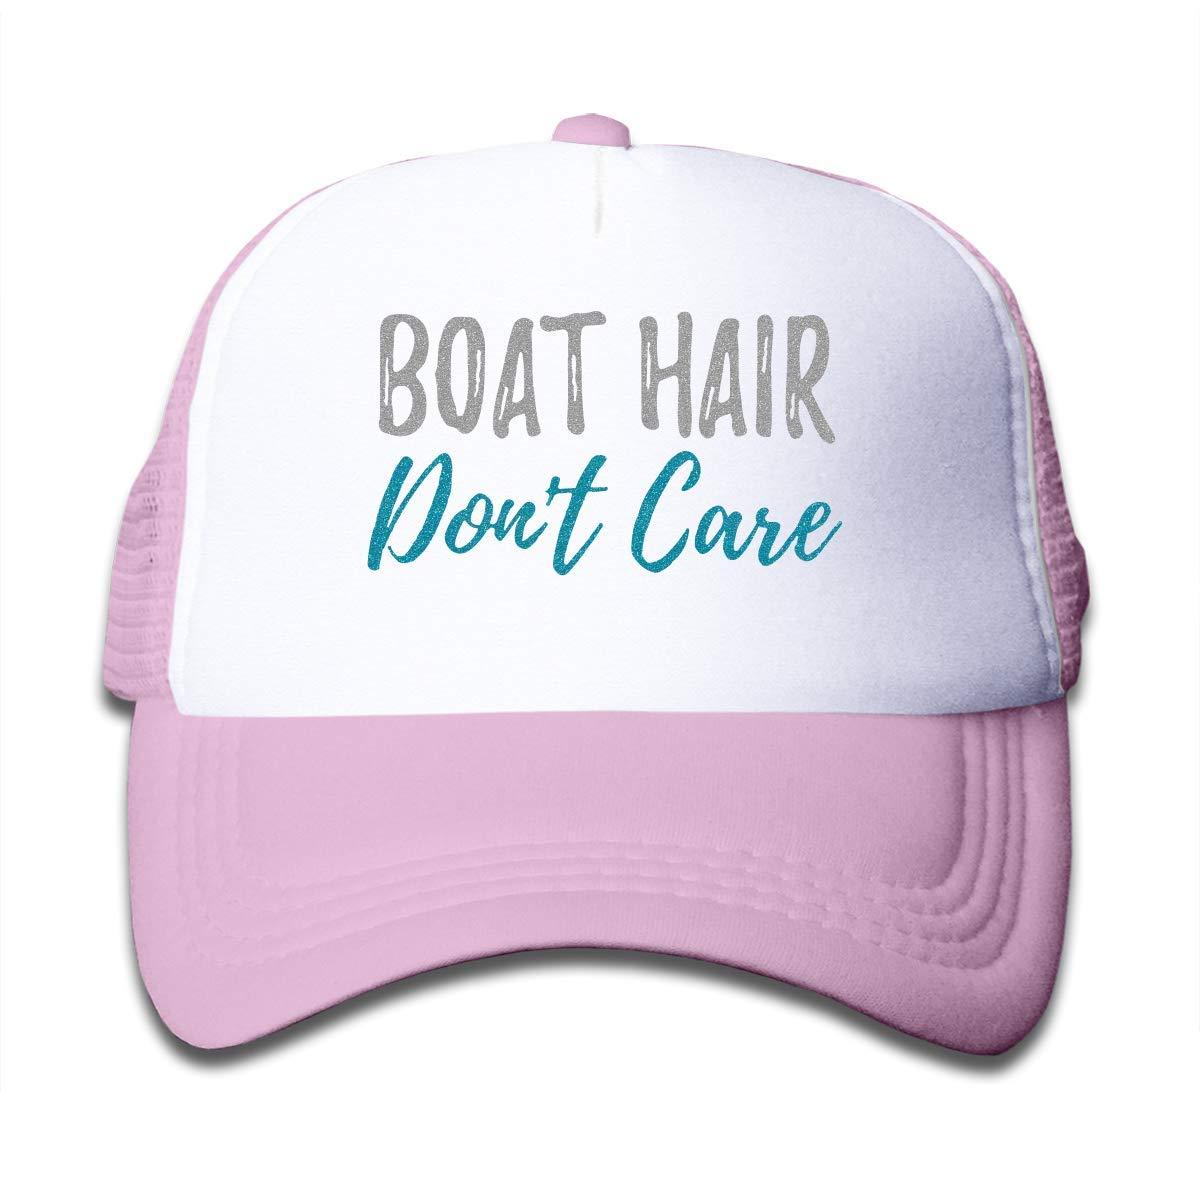 Magic Jame Kids Boat Hair Don't Care Mesh Cap Trucker Hats Adjustable Baseball Cap Children Plain Hat